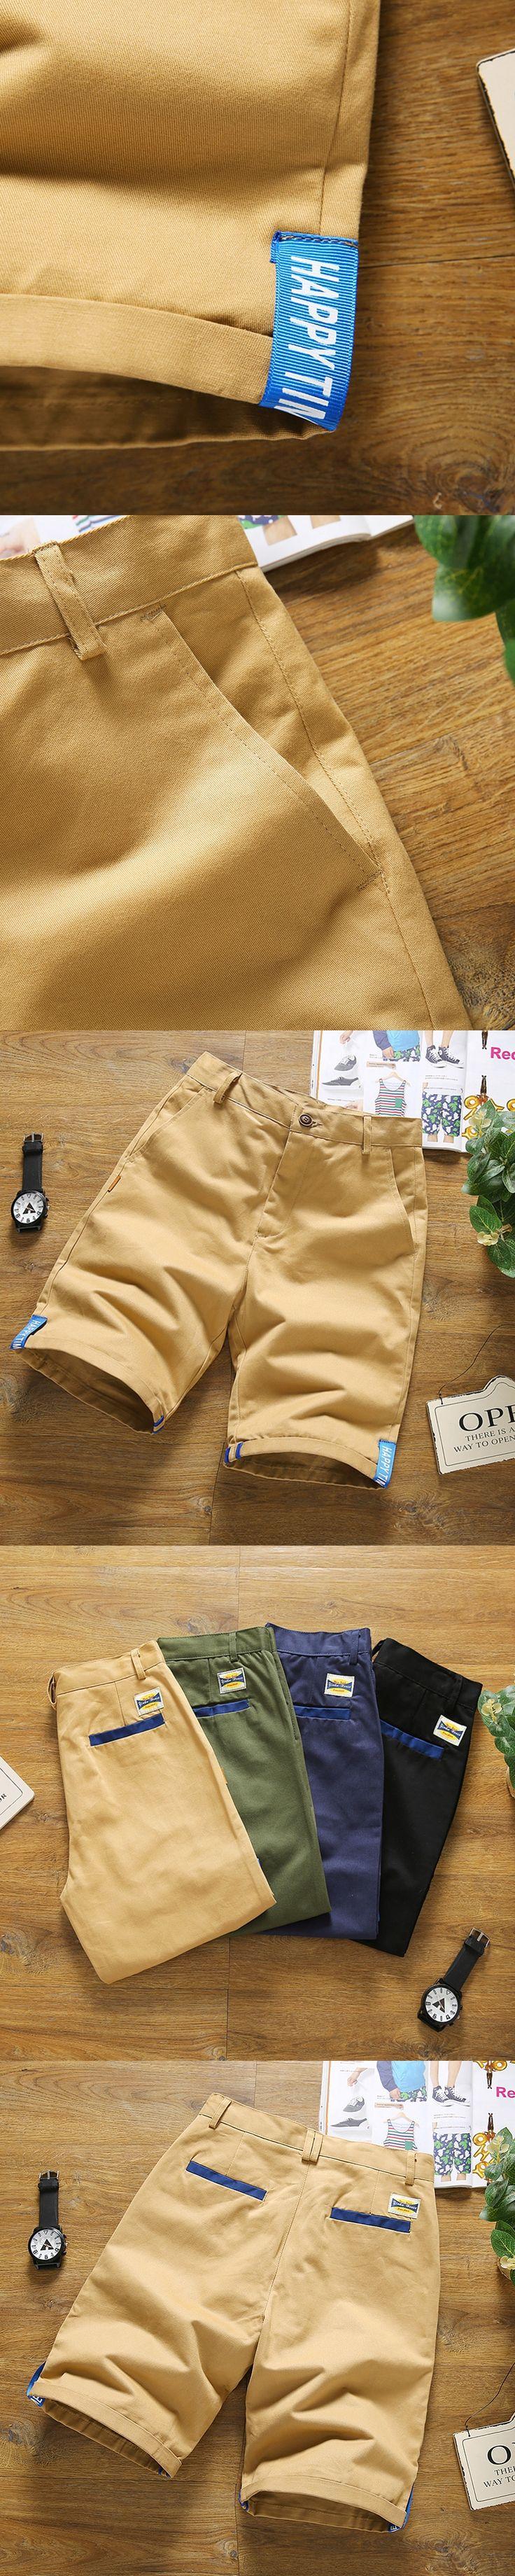 short cargo mesh shorts men cord jeans linen bermuda masculina beach compression summer court homme fitness masculino k221